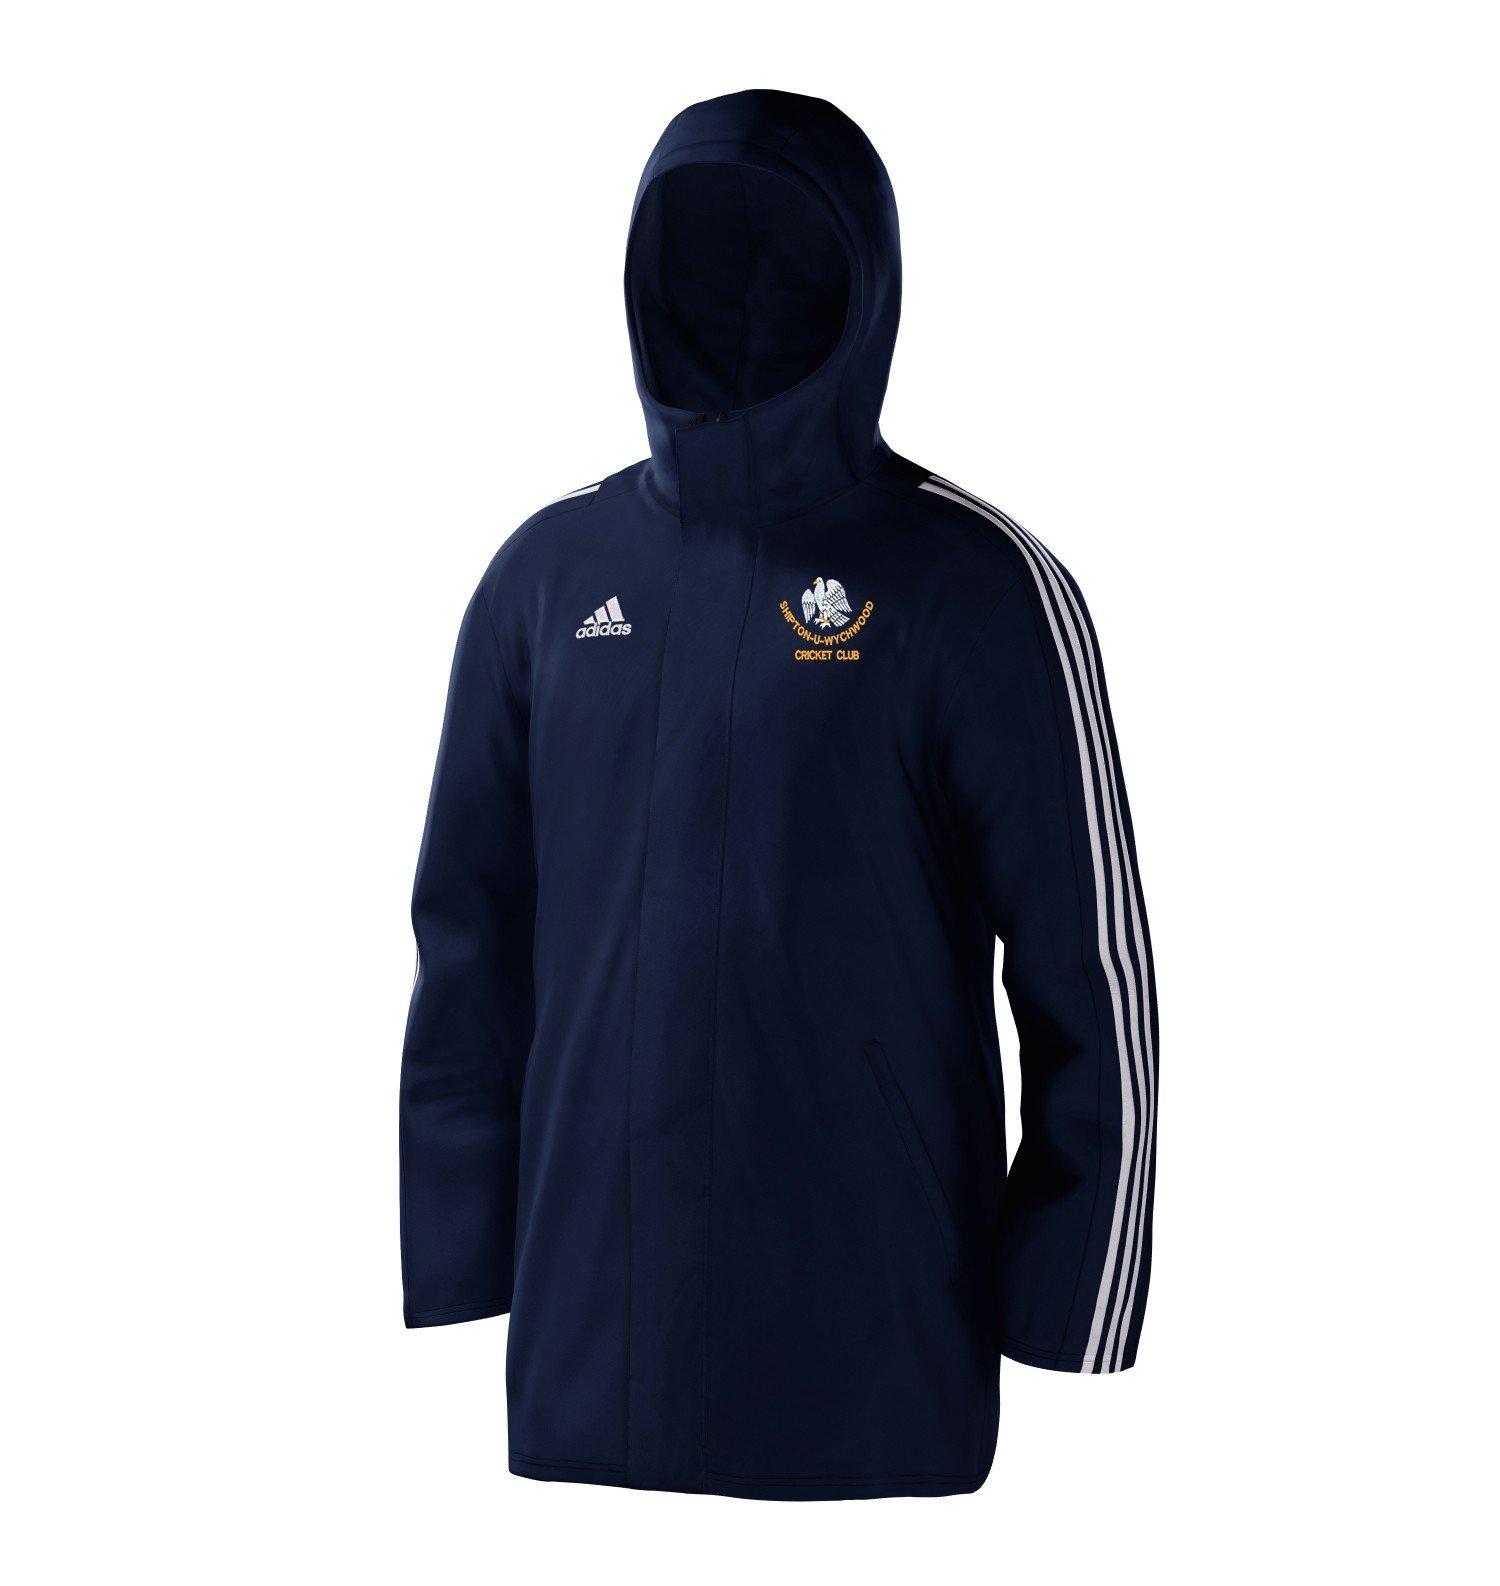 Shipton Under Wychwood Cricket Club Navy Adidas Stadium Jacket